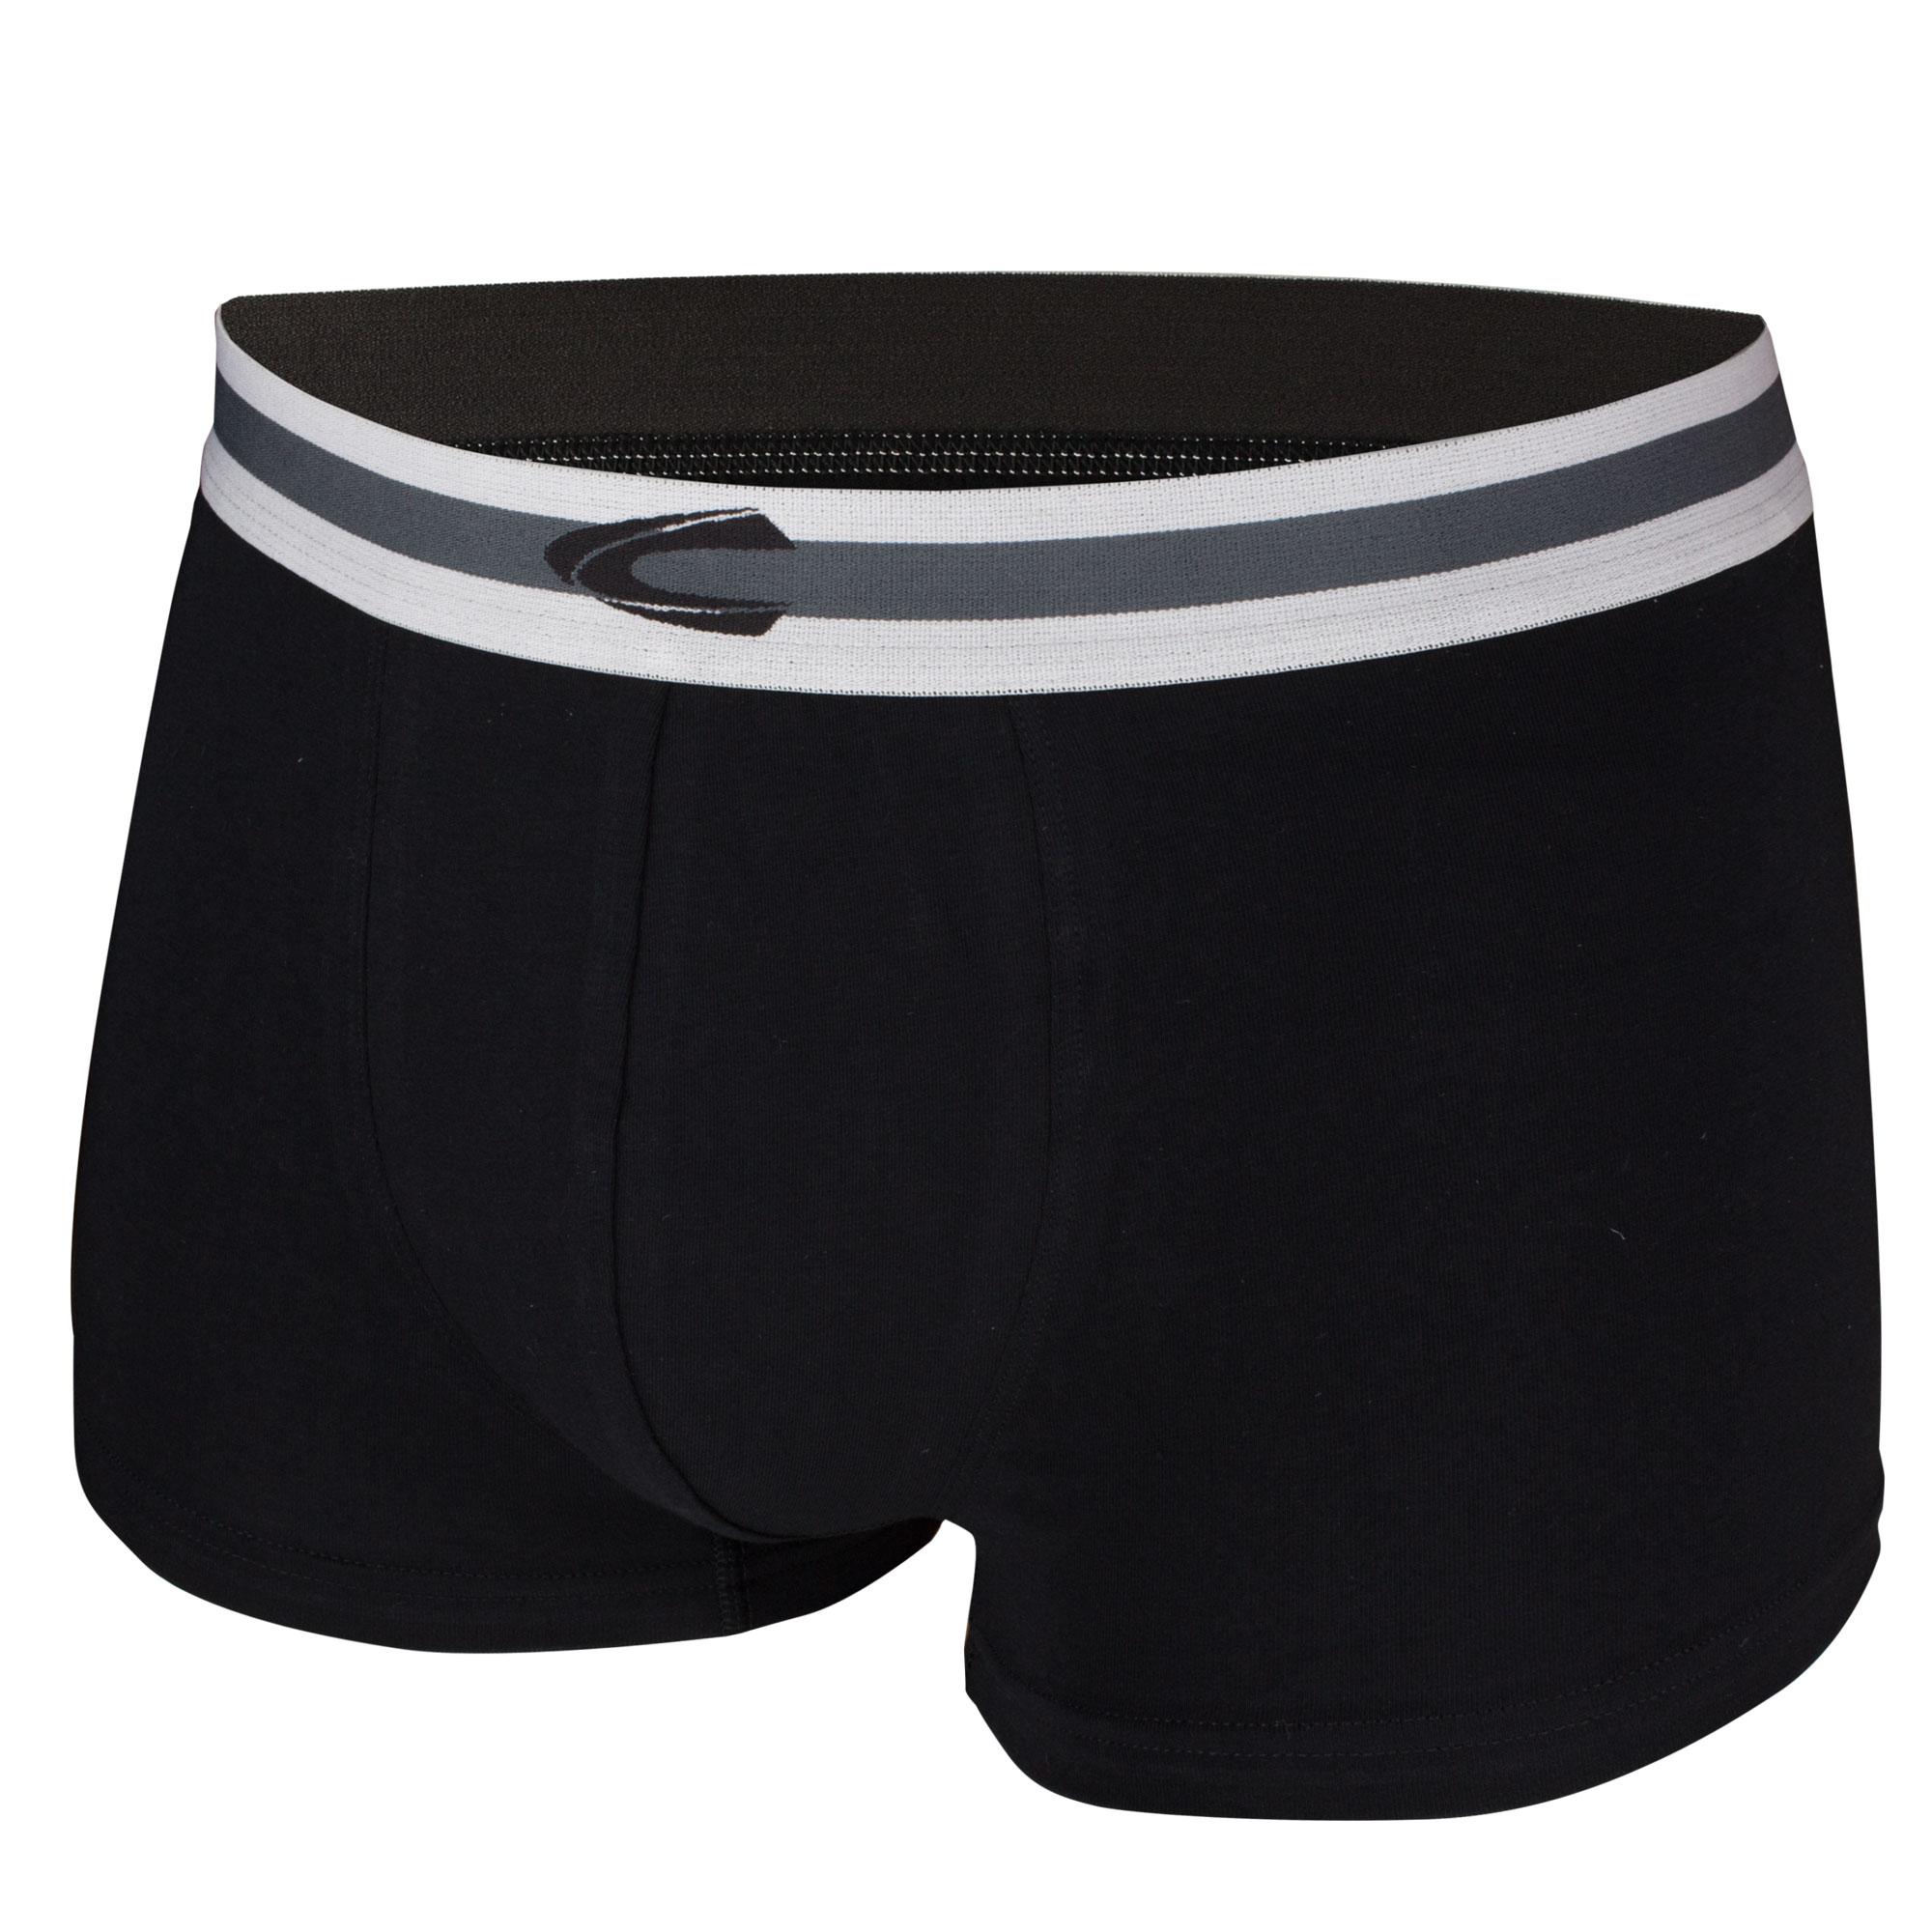 Camel Active Herren Boxershorts, Unterhosen, 2er Pack – Bild 3